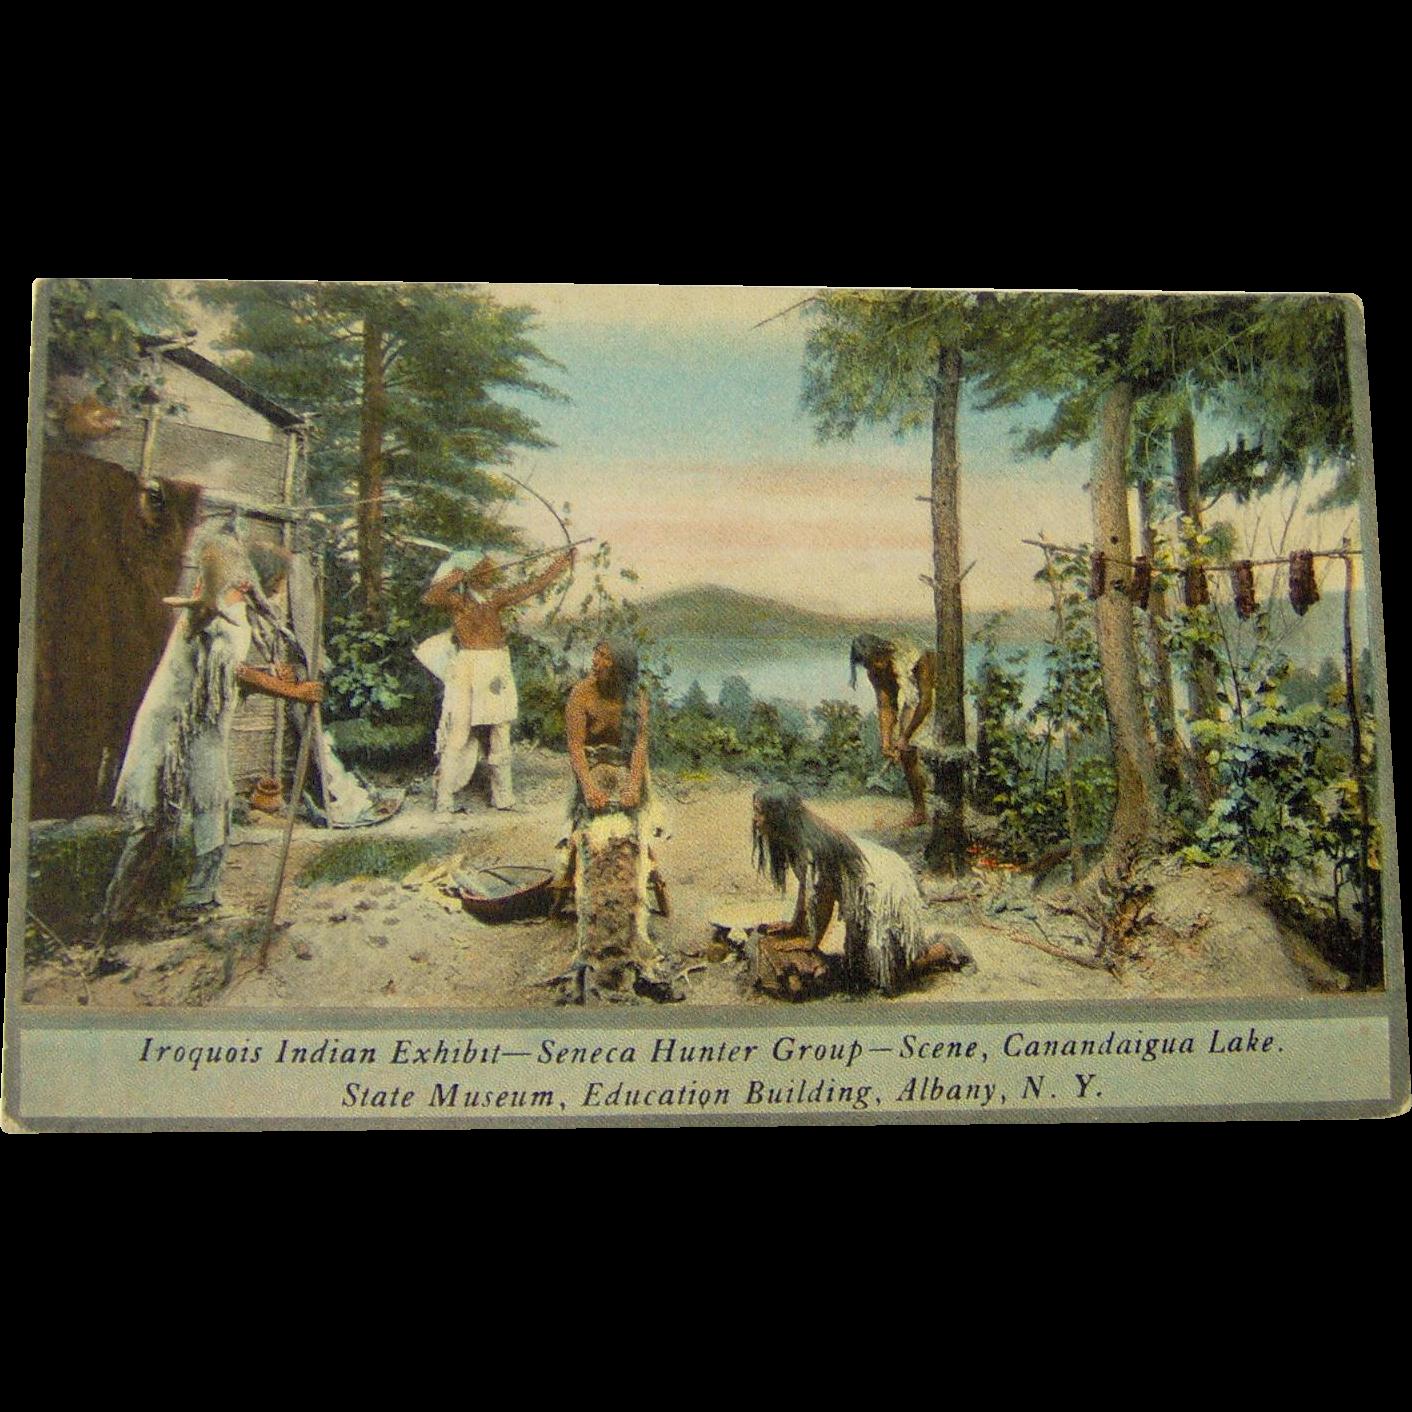 Iroquois Indian Exhibit - Seneca Hunters Group